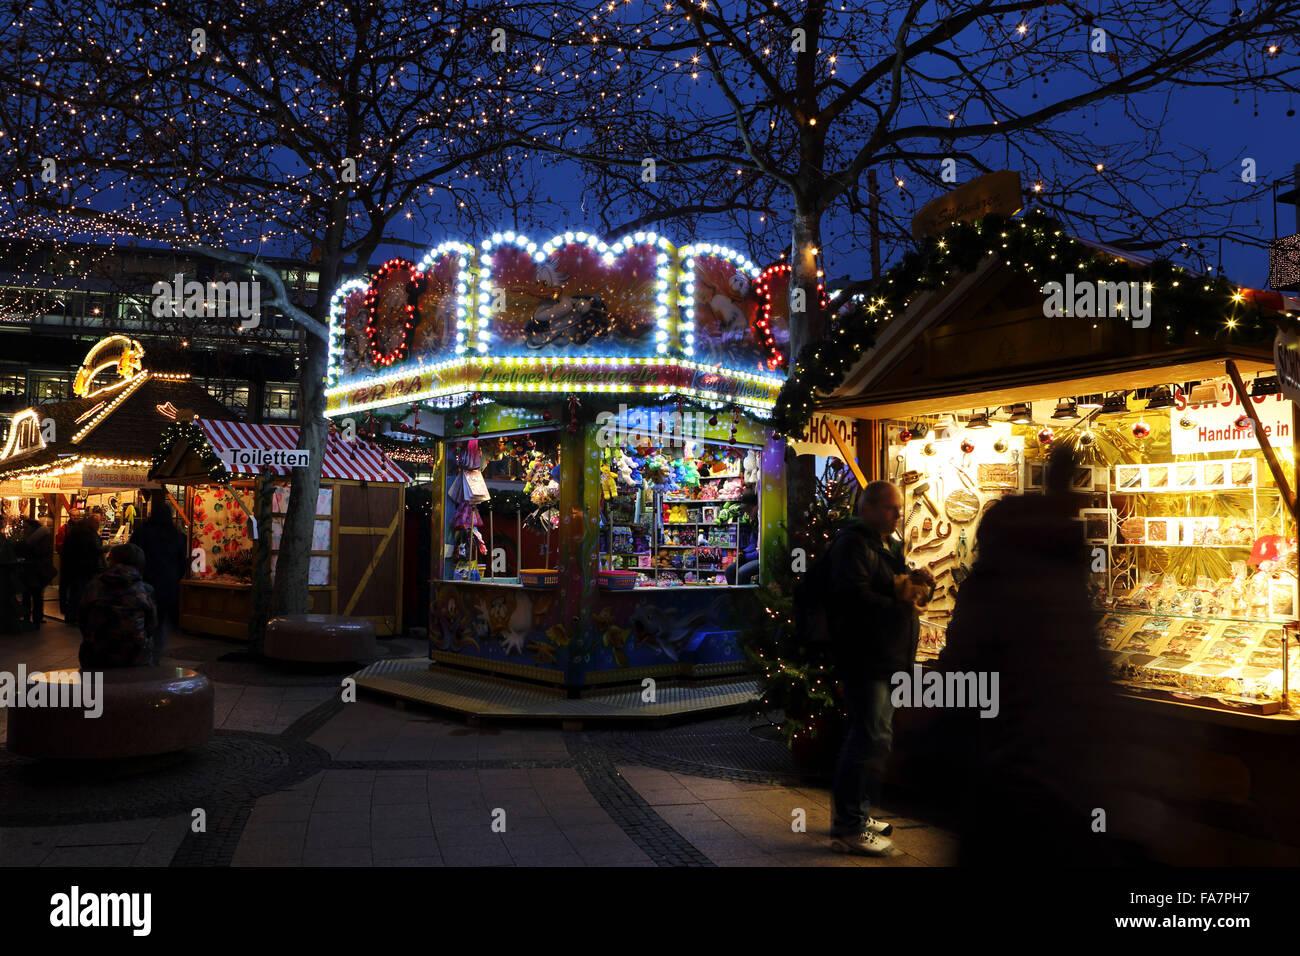 Stalls at the City Weihnachtsmarkt am Gedachtniskirche Christmas market on Ku'damm in Berlin, Germany. - Stock Image